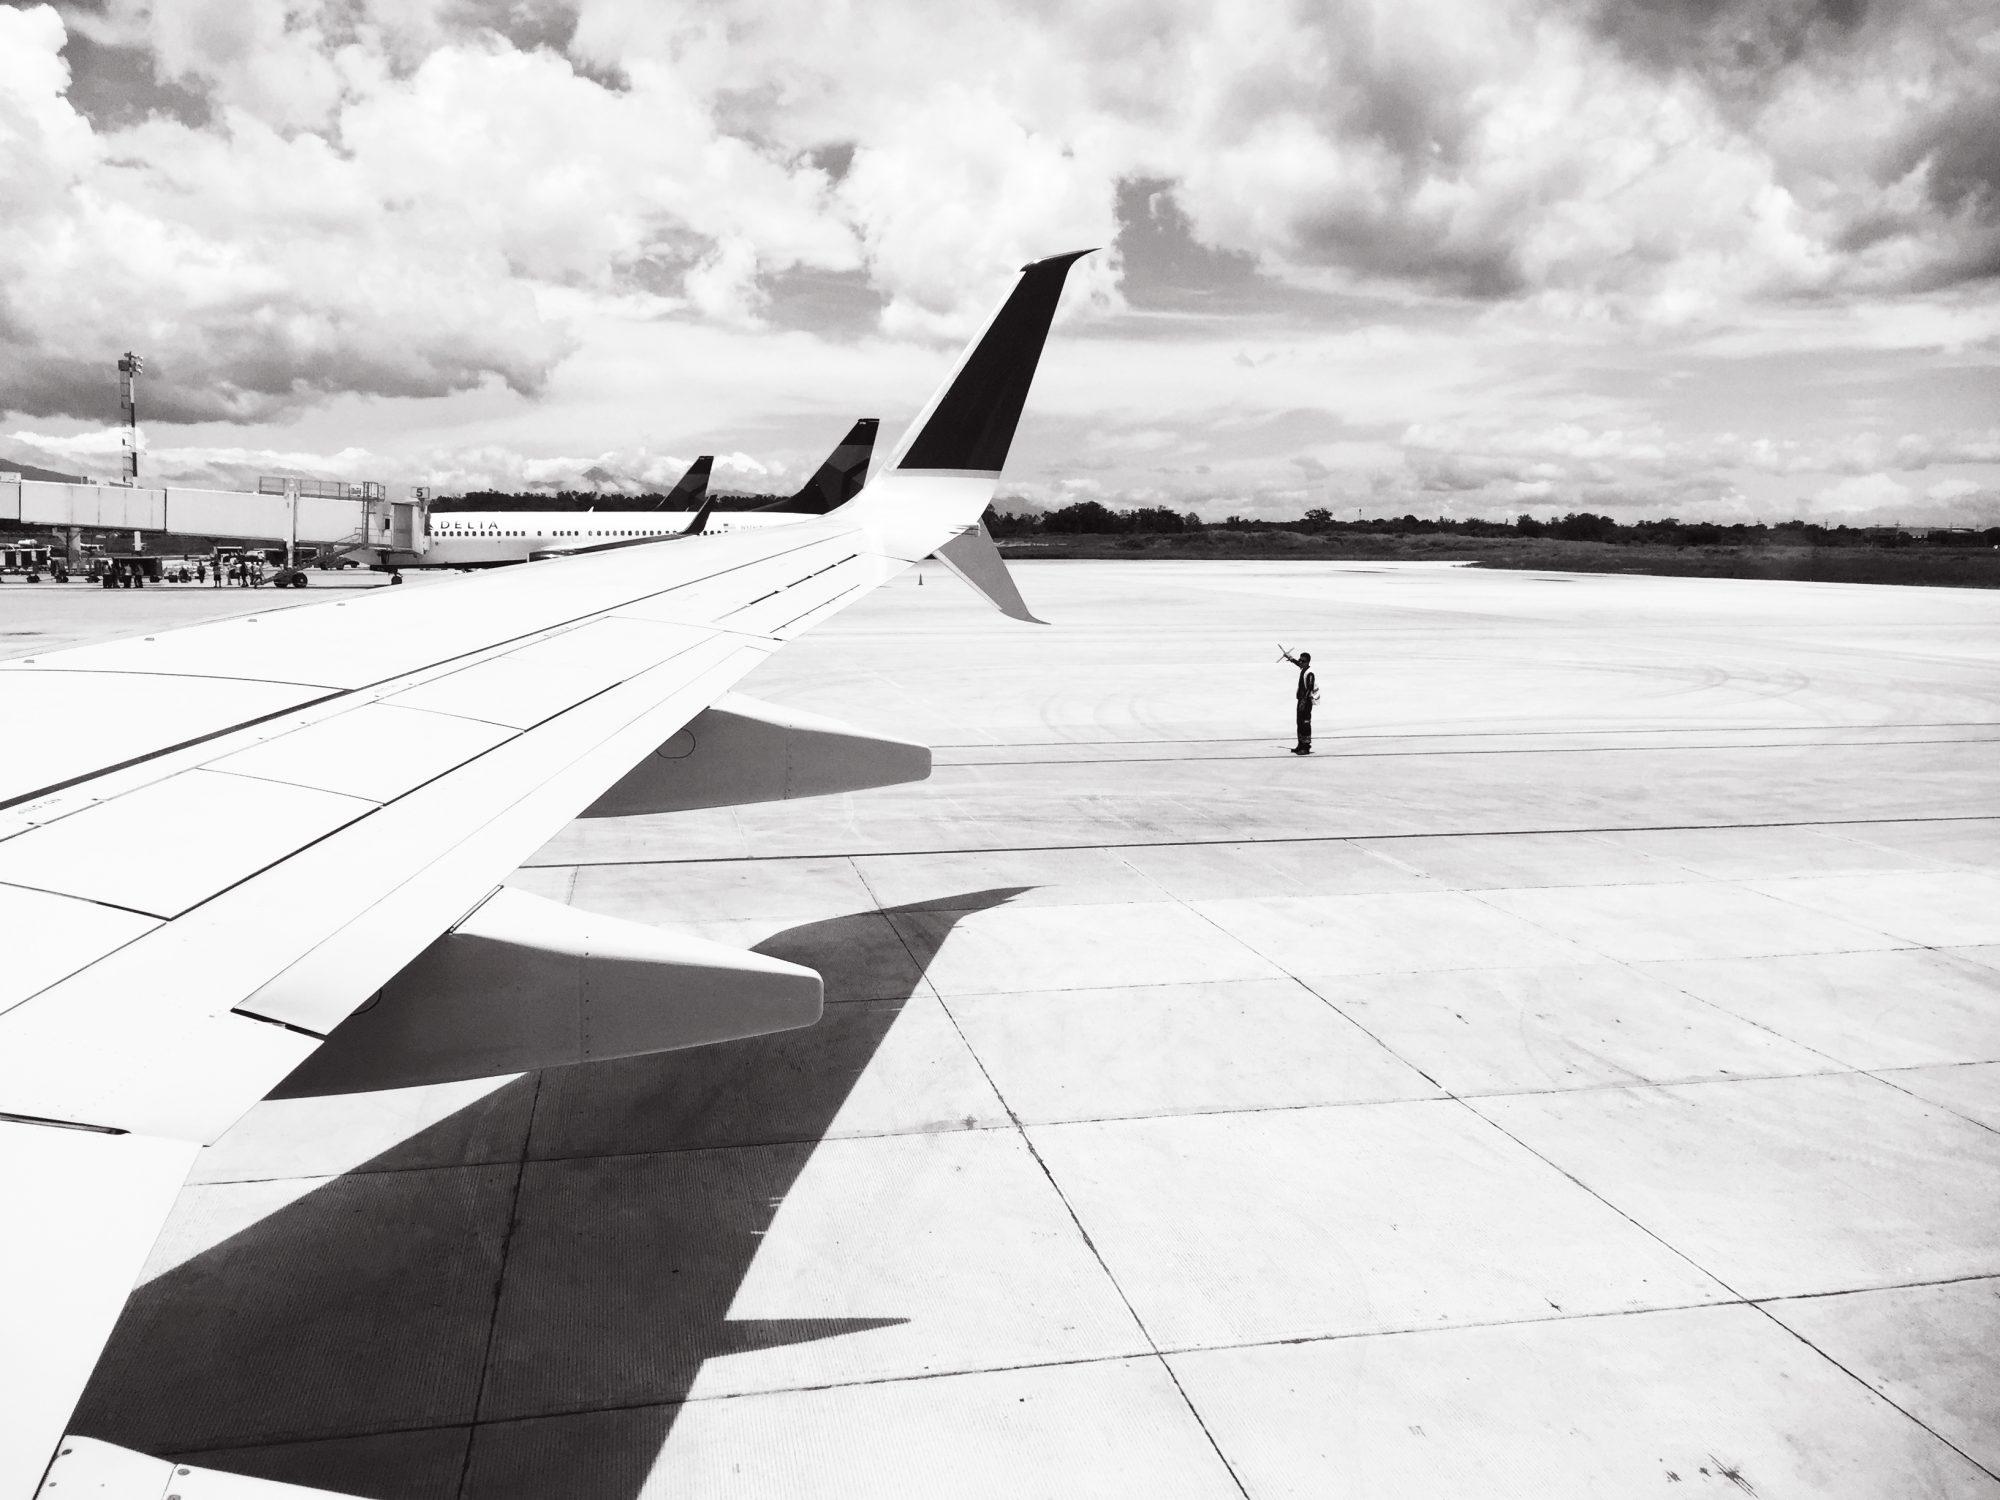 Airport runway, Costa Rica